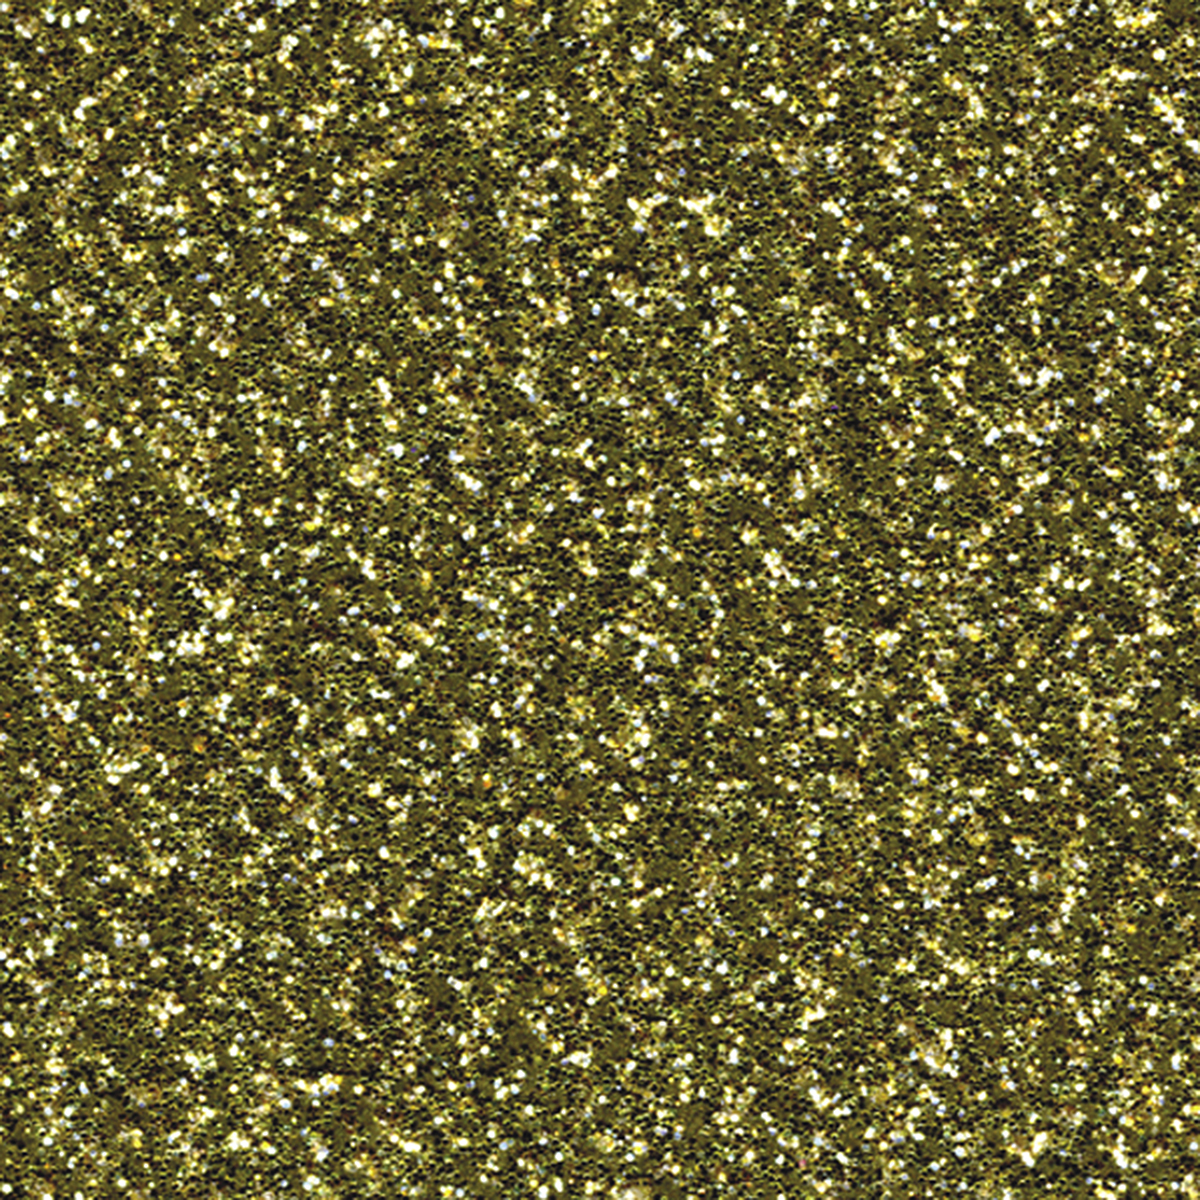 PPR-GLITTER KING'S CROWN GOLD